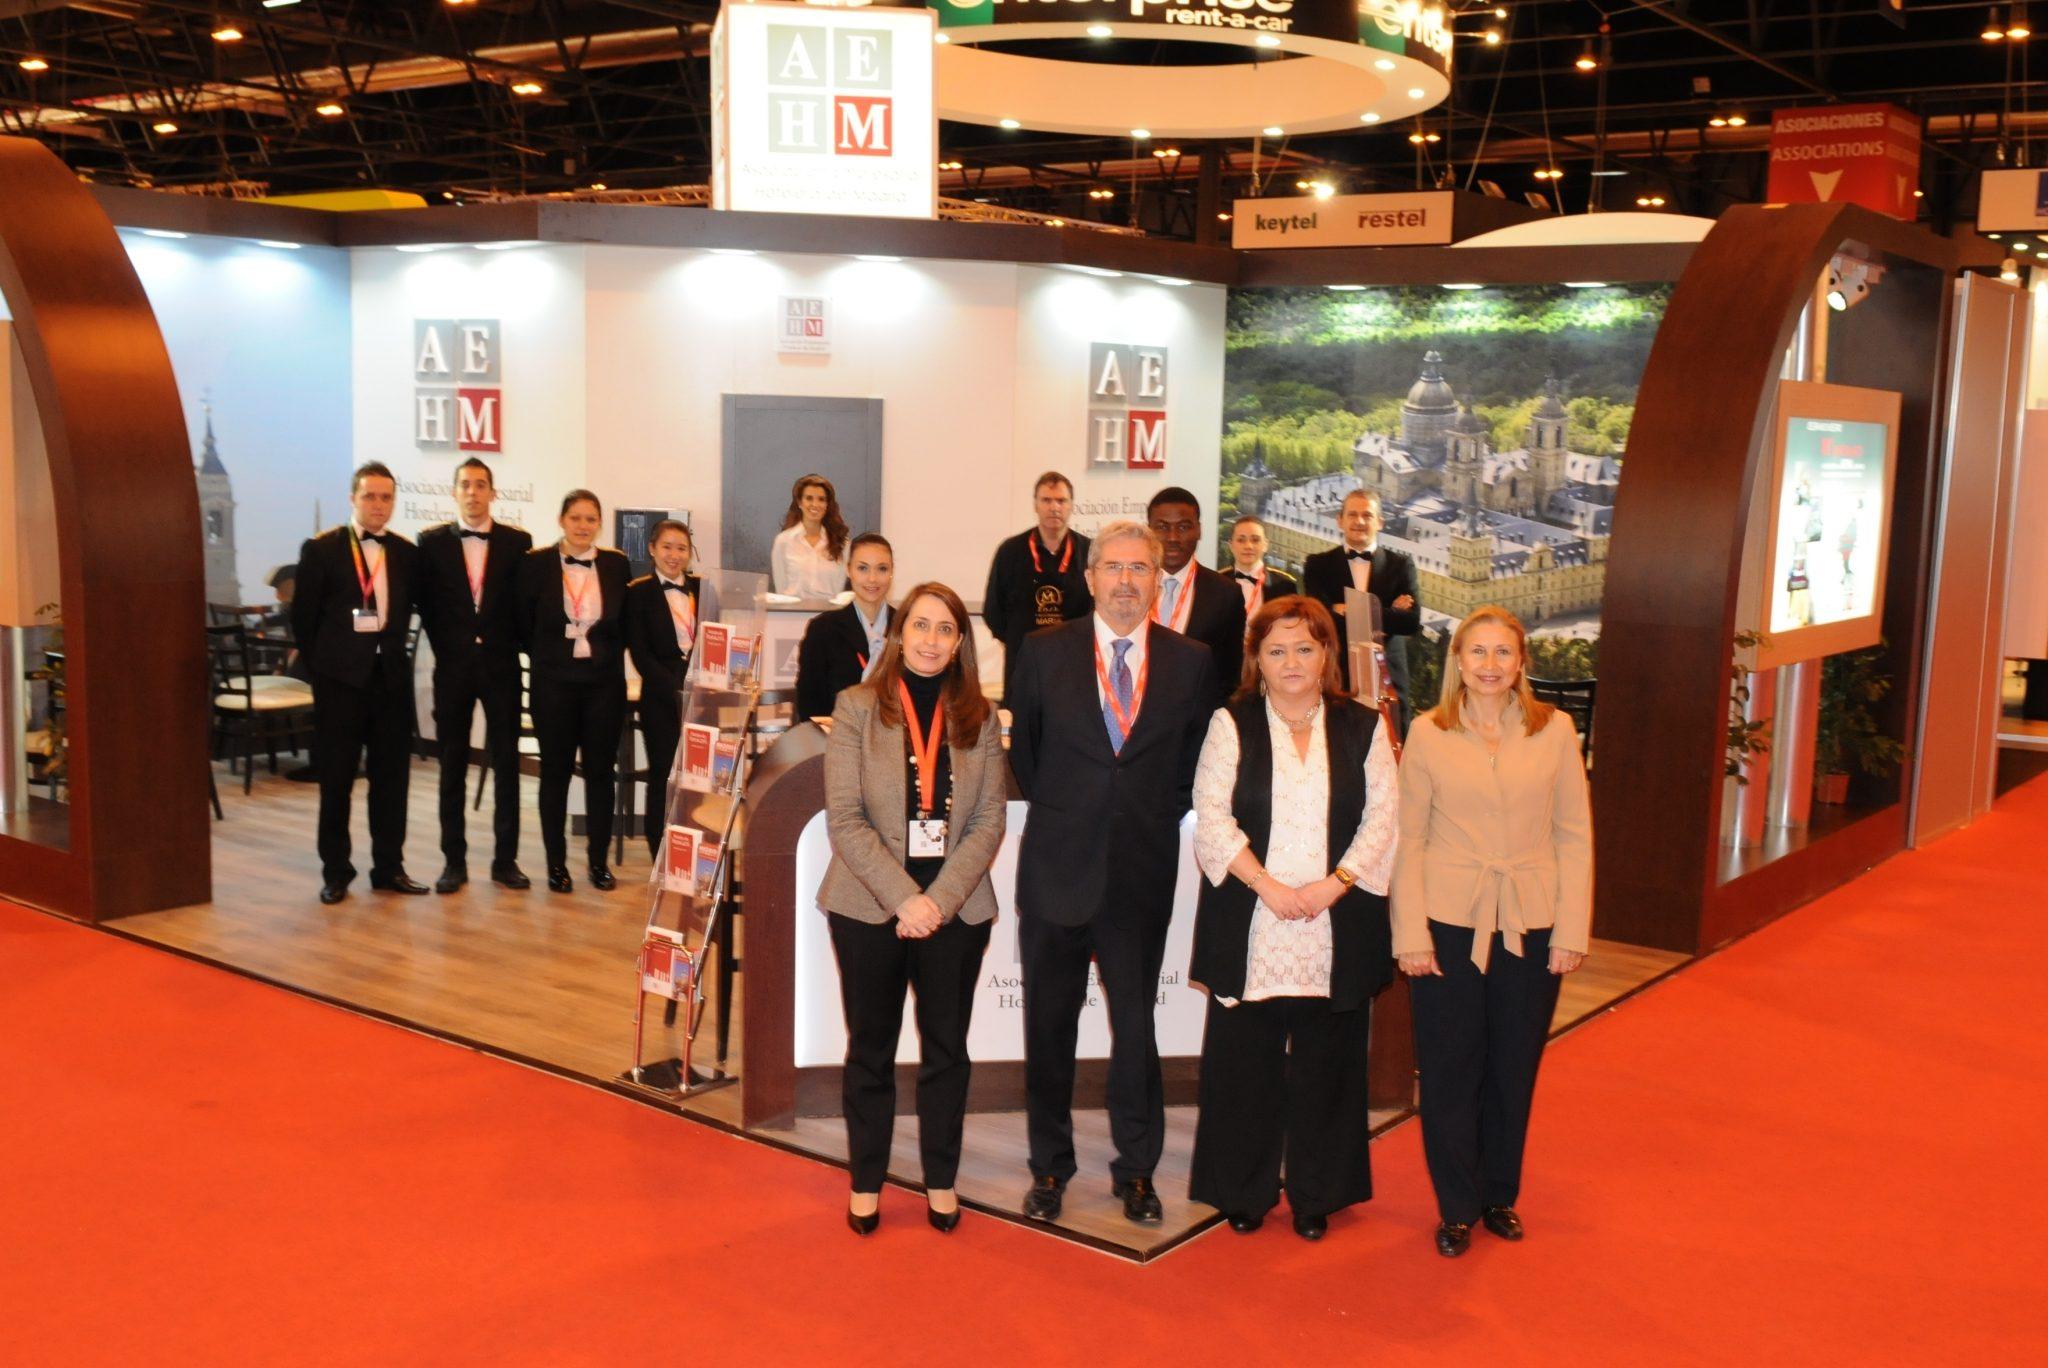 Asociacion de Empresarios hoteleros en Madrid e Ifema